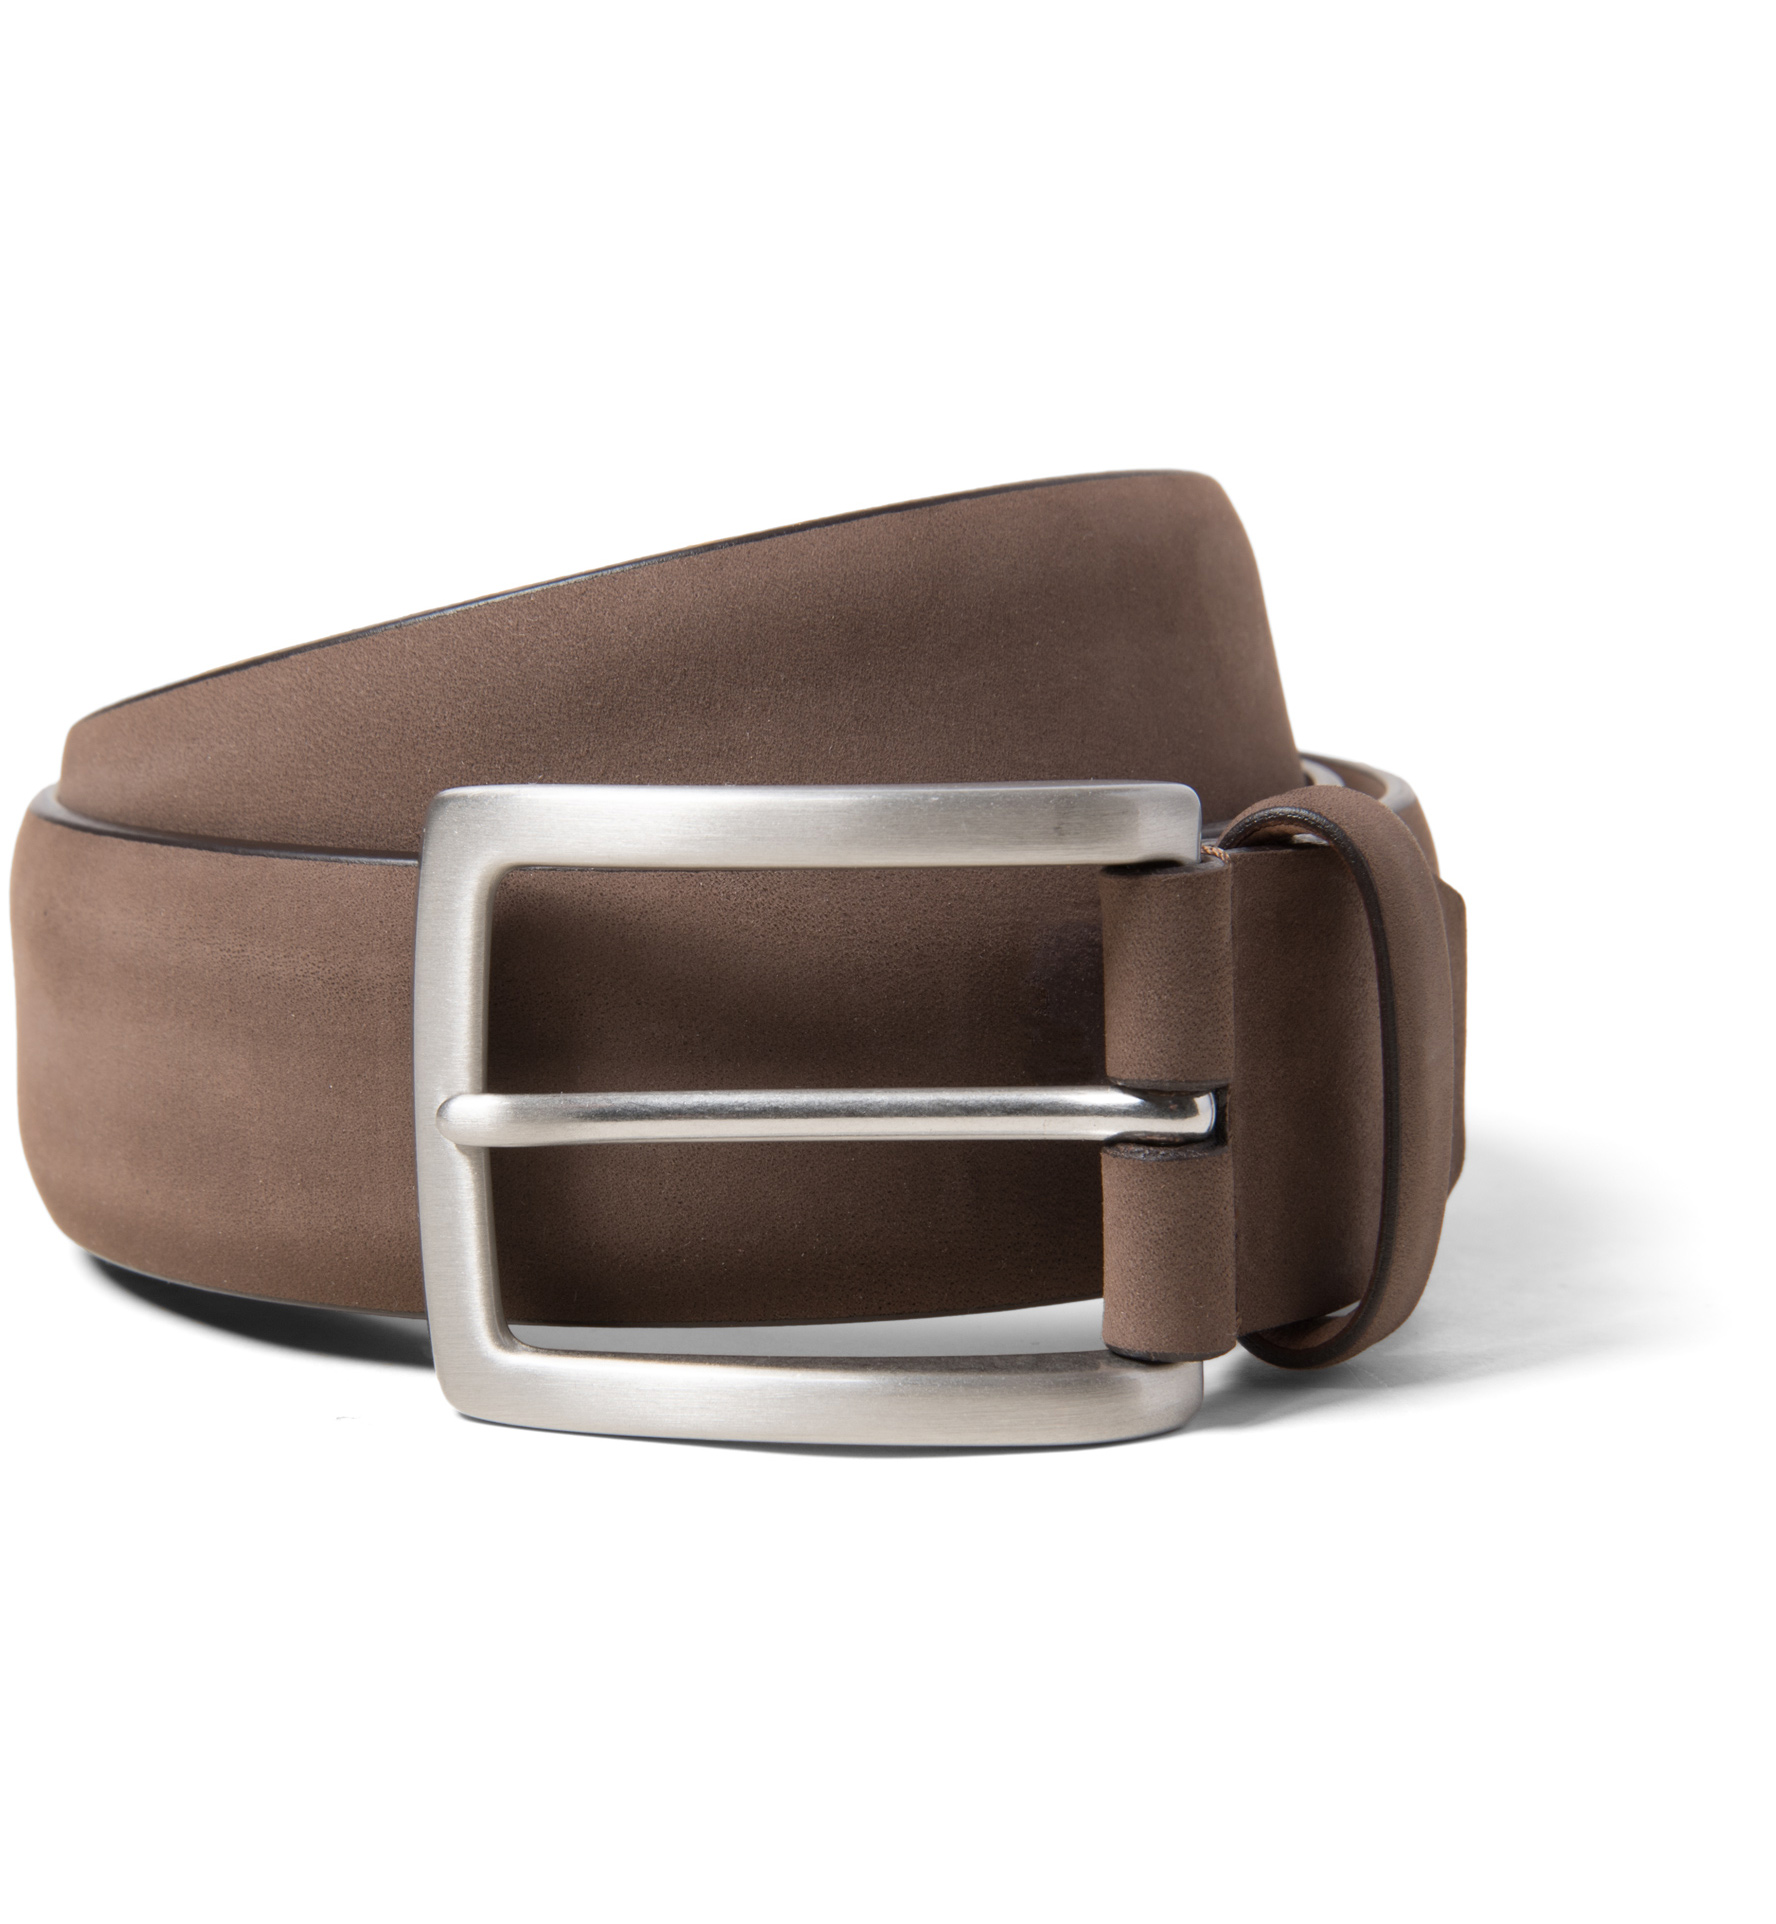 Zoom Image of Brown Nubuck Belt